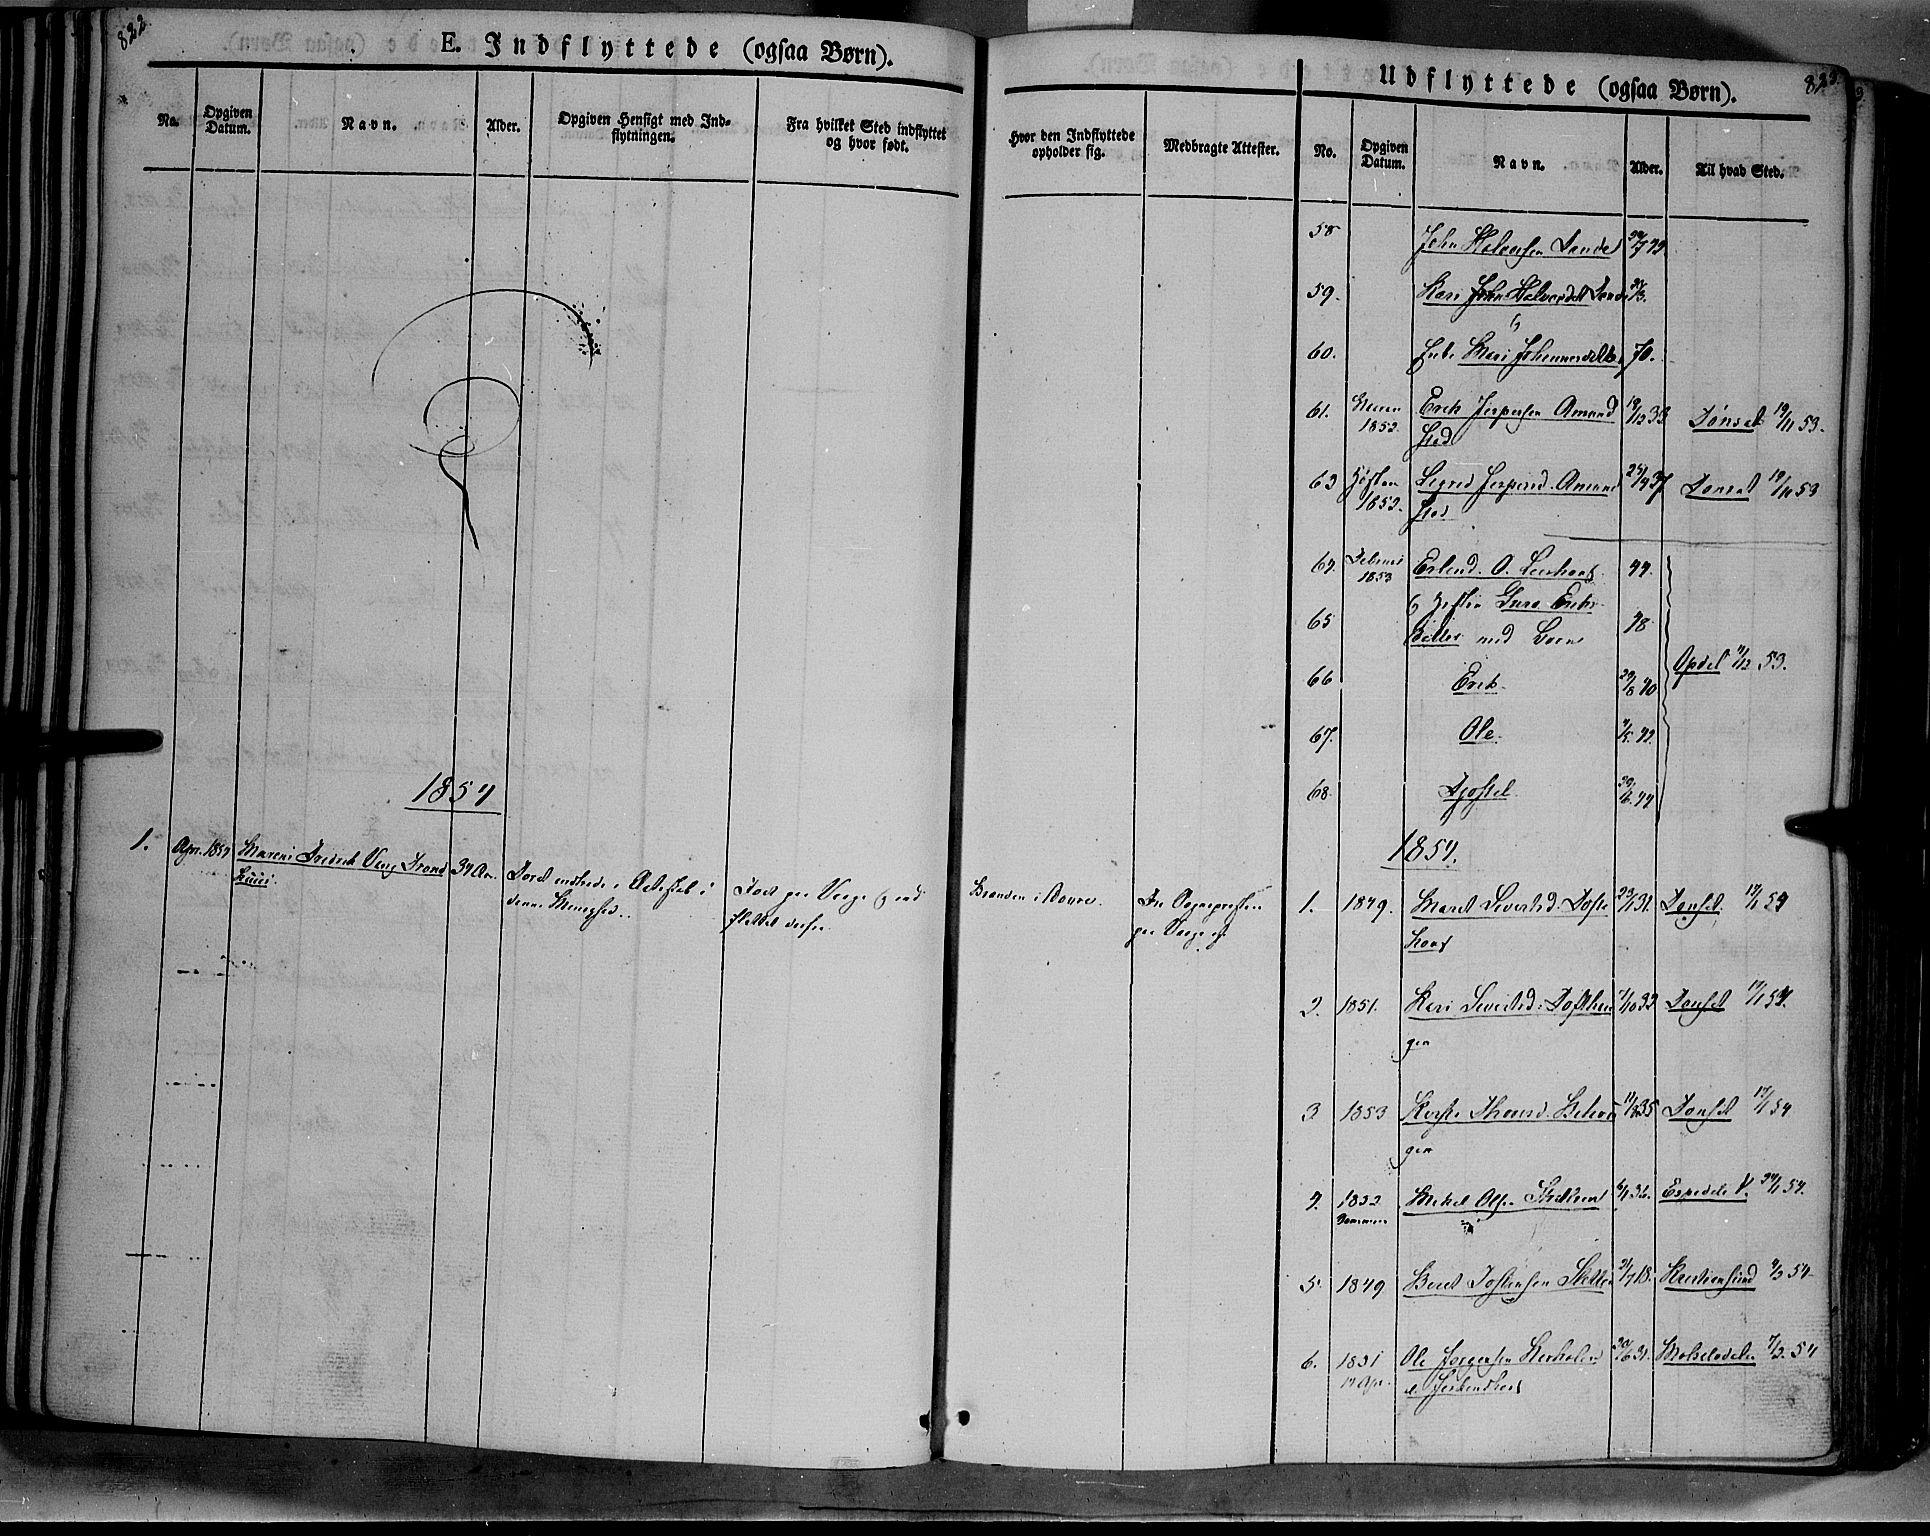 SAH, Lesja prestekontor, Ministerialbok nr. 6B, 1843-1854, s. 822-823